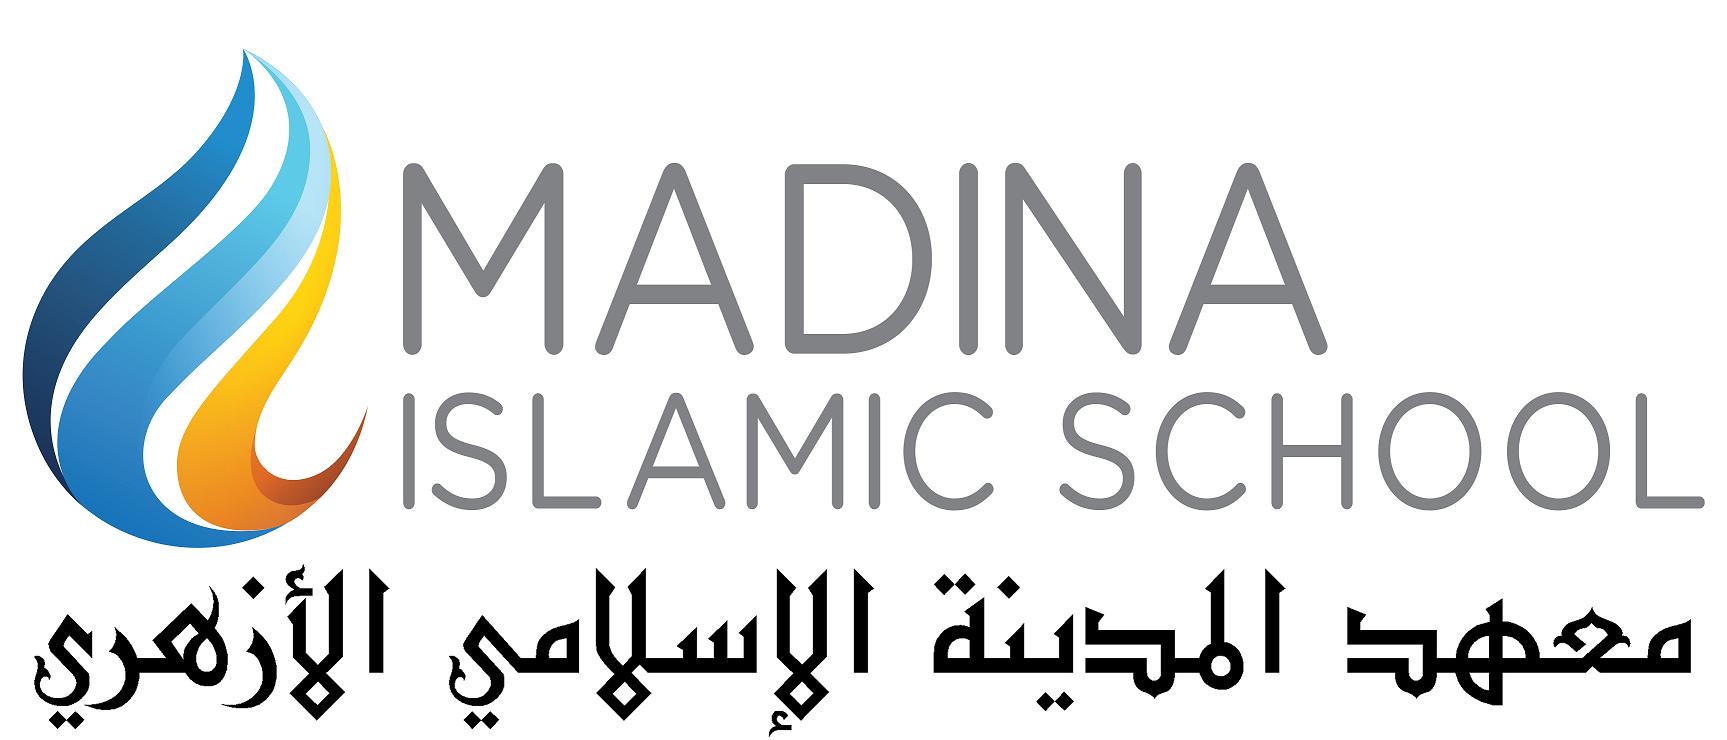 Madina Islamic School